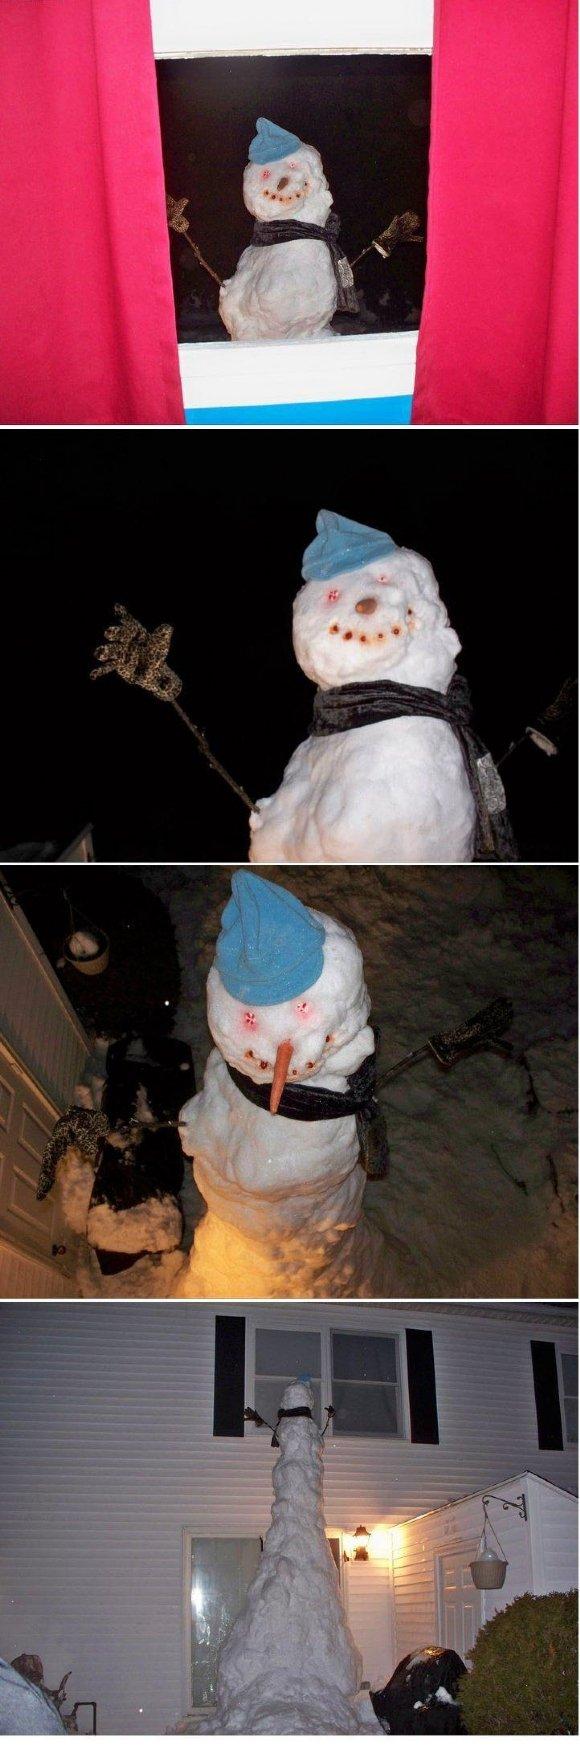 Creepy Snowman. Not mine, I'll admit it. <br /> <br /> If you don't thumb up, that snowman will be outside your bedroom tonight...loljk.. K-kill meee... snowman creepy creeper tall weird Temari